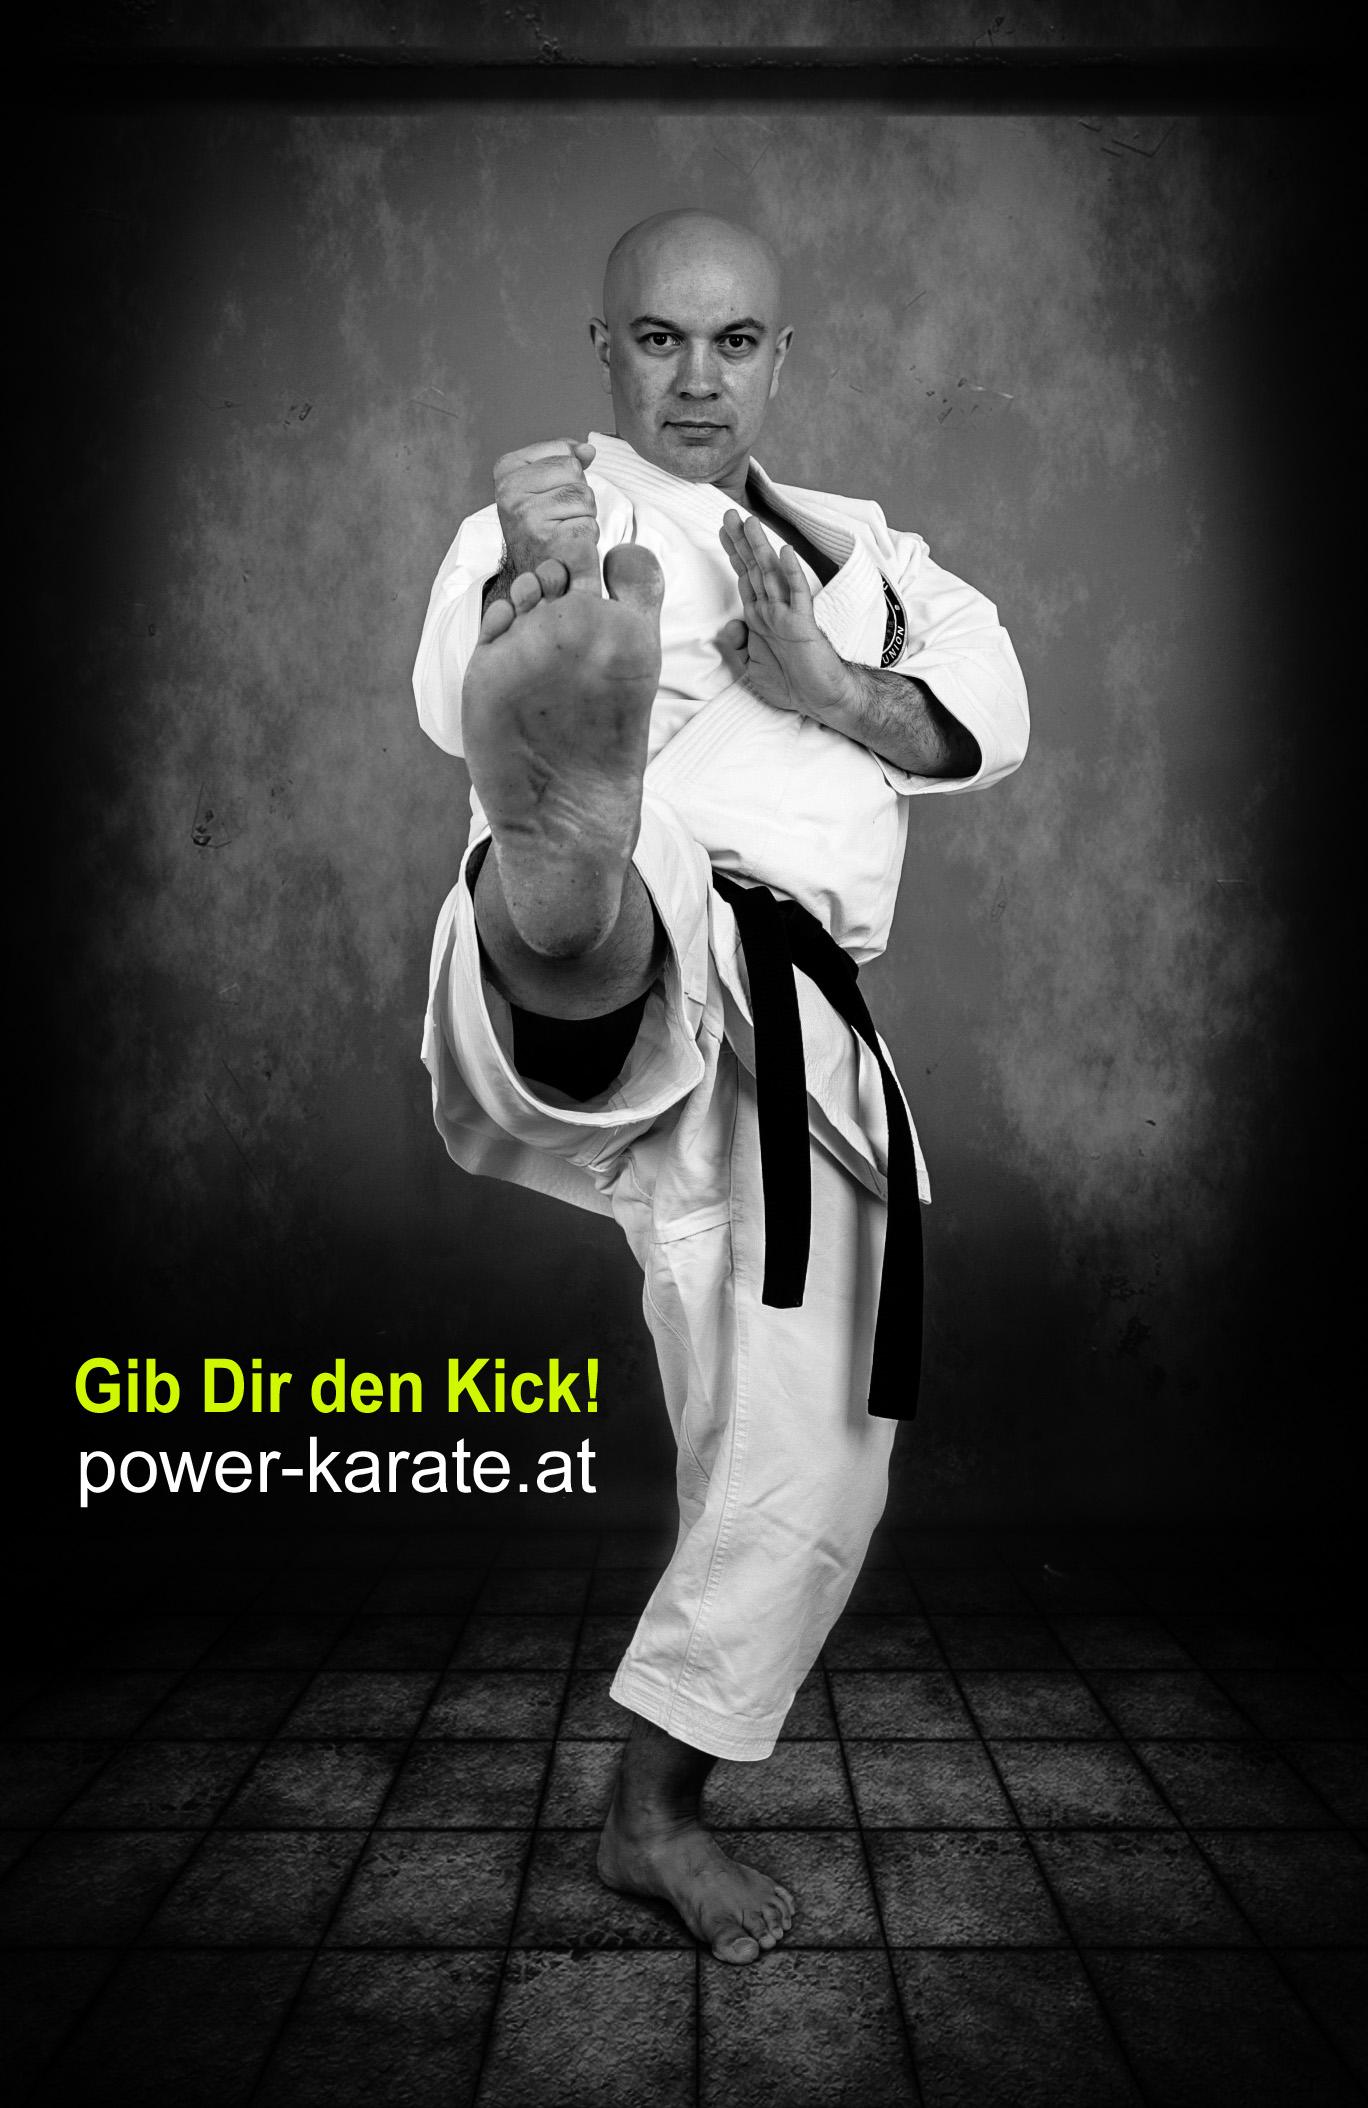 Gib Dir den Kick Erich 2 web